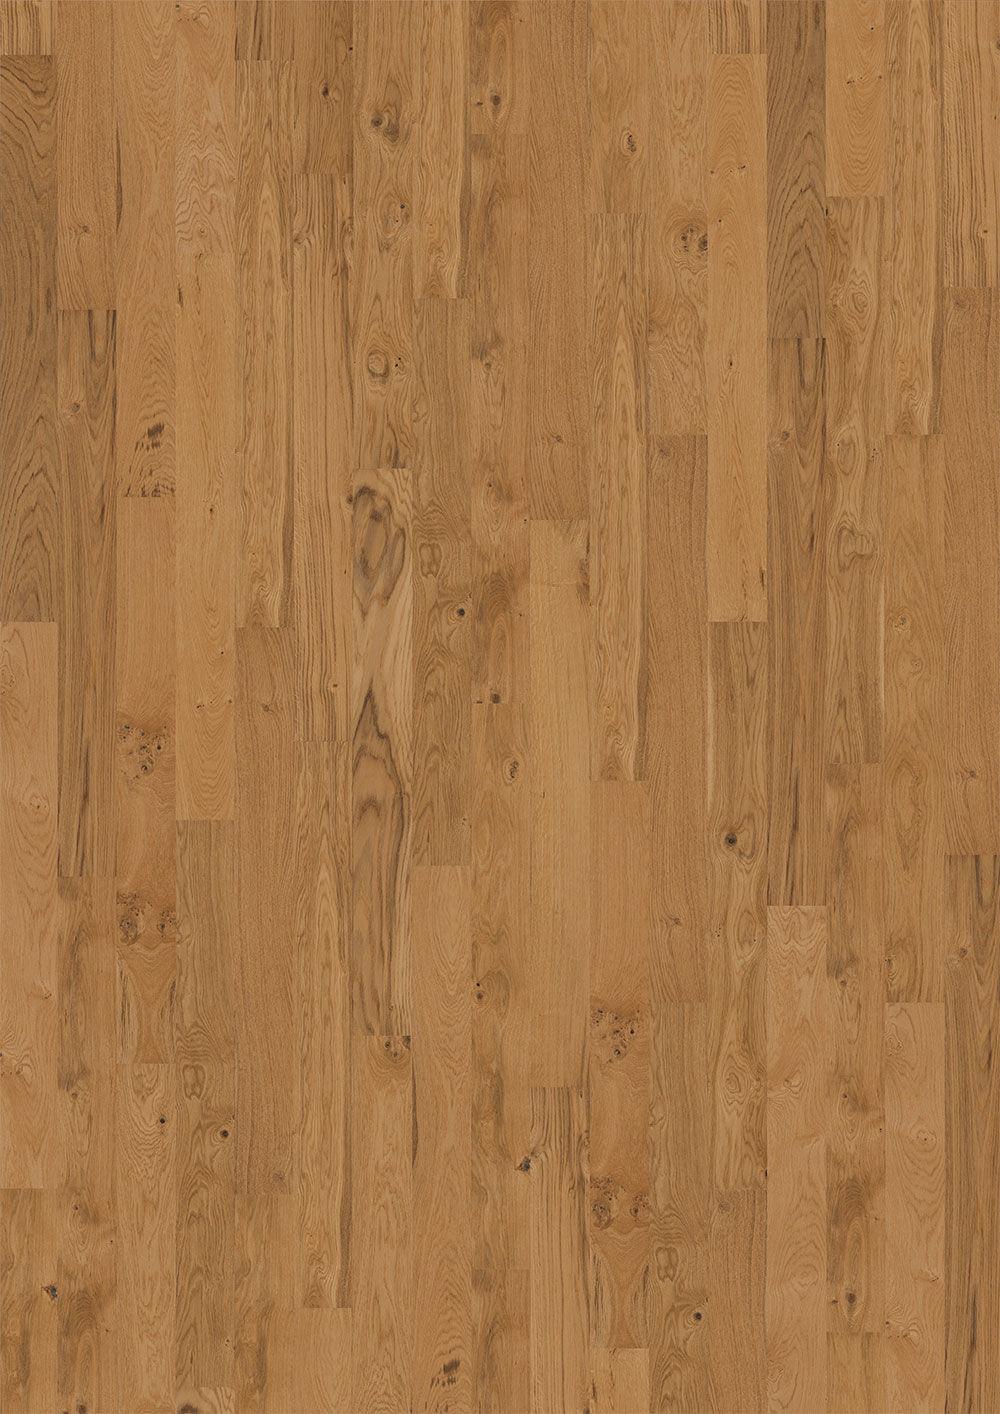 Kahrs Spirit Hardwood Flooring Unity Park Oak